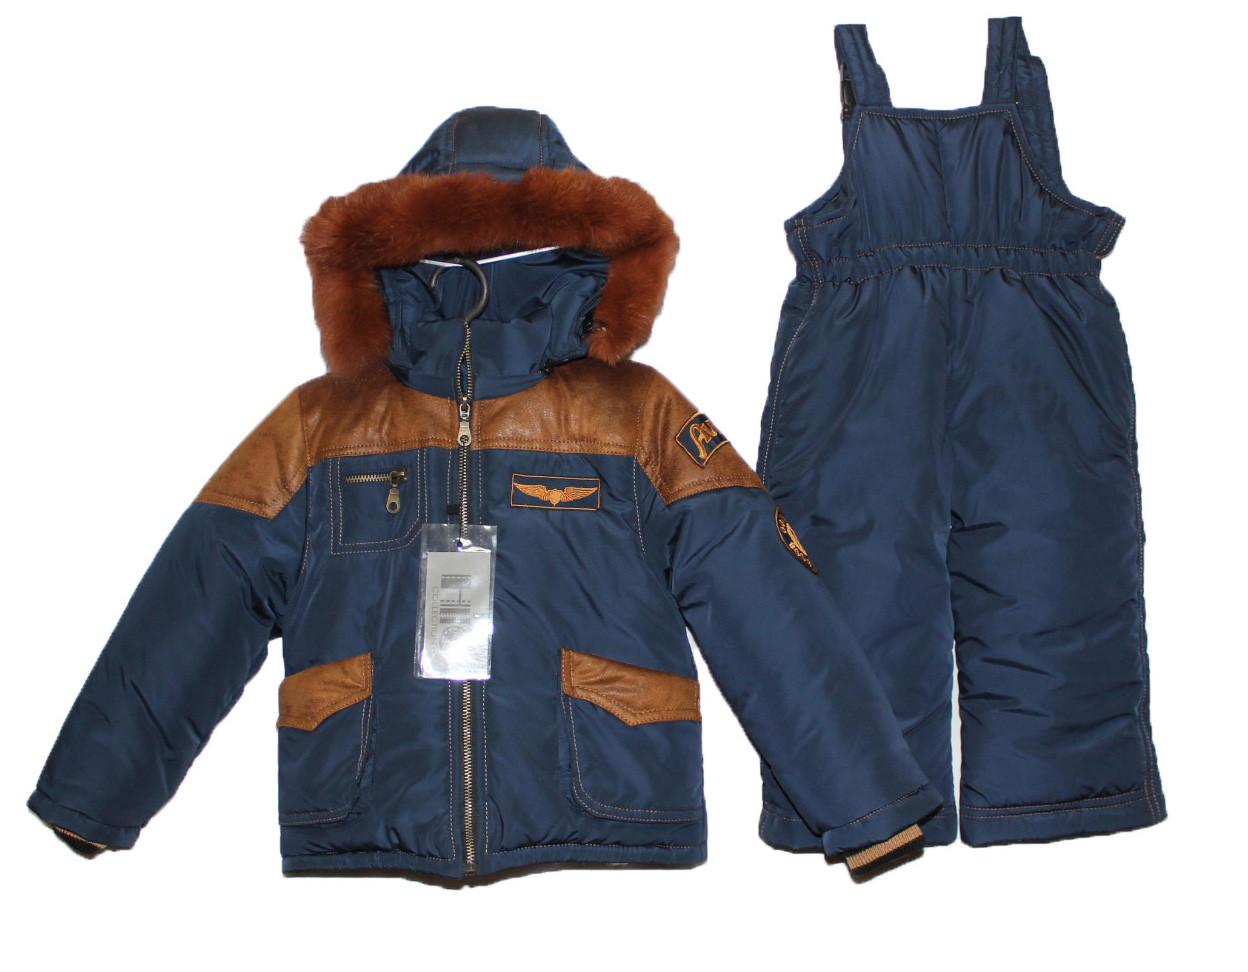 Комбинезон детский зимний для мальчика на овчине HL 112